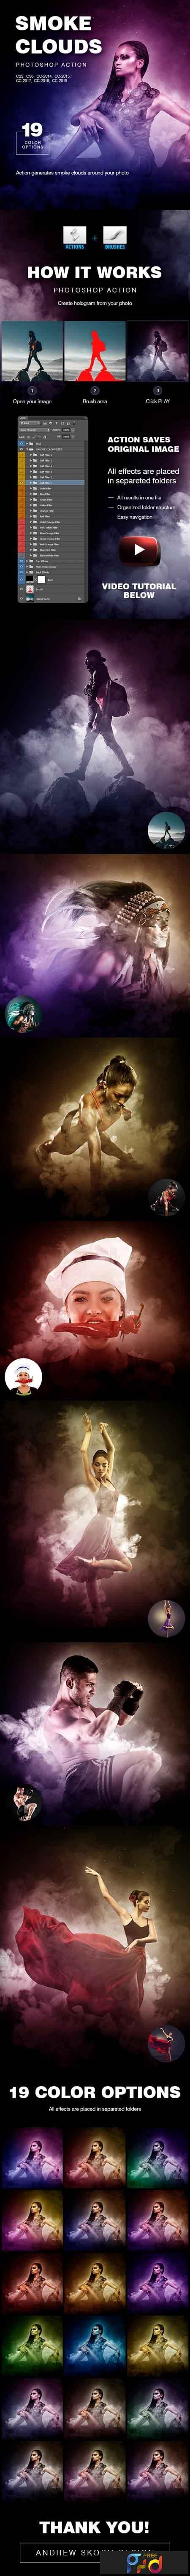 Smoke Clouds Photoshop Action 23329935 - FreePSDvn